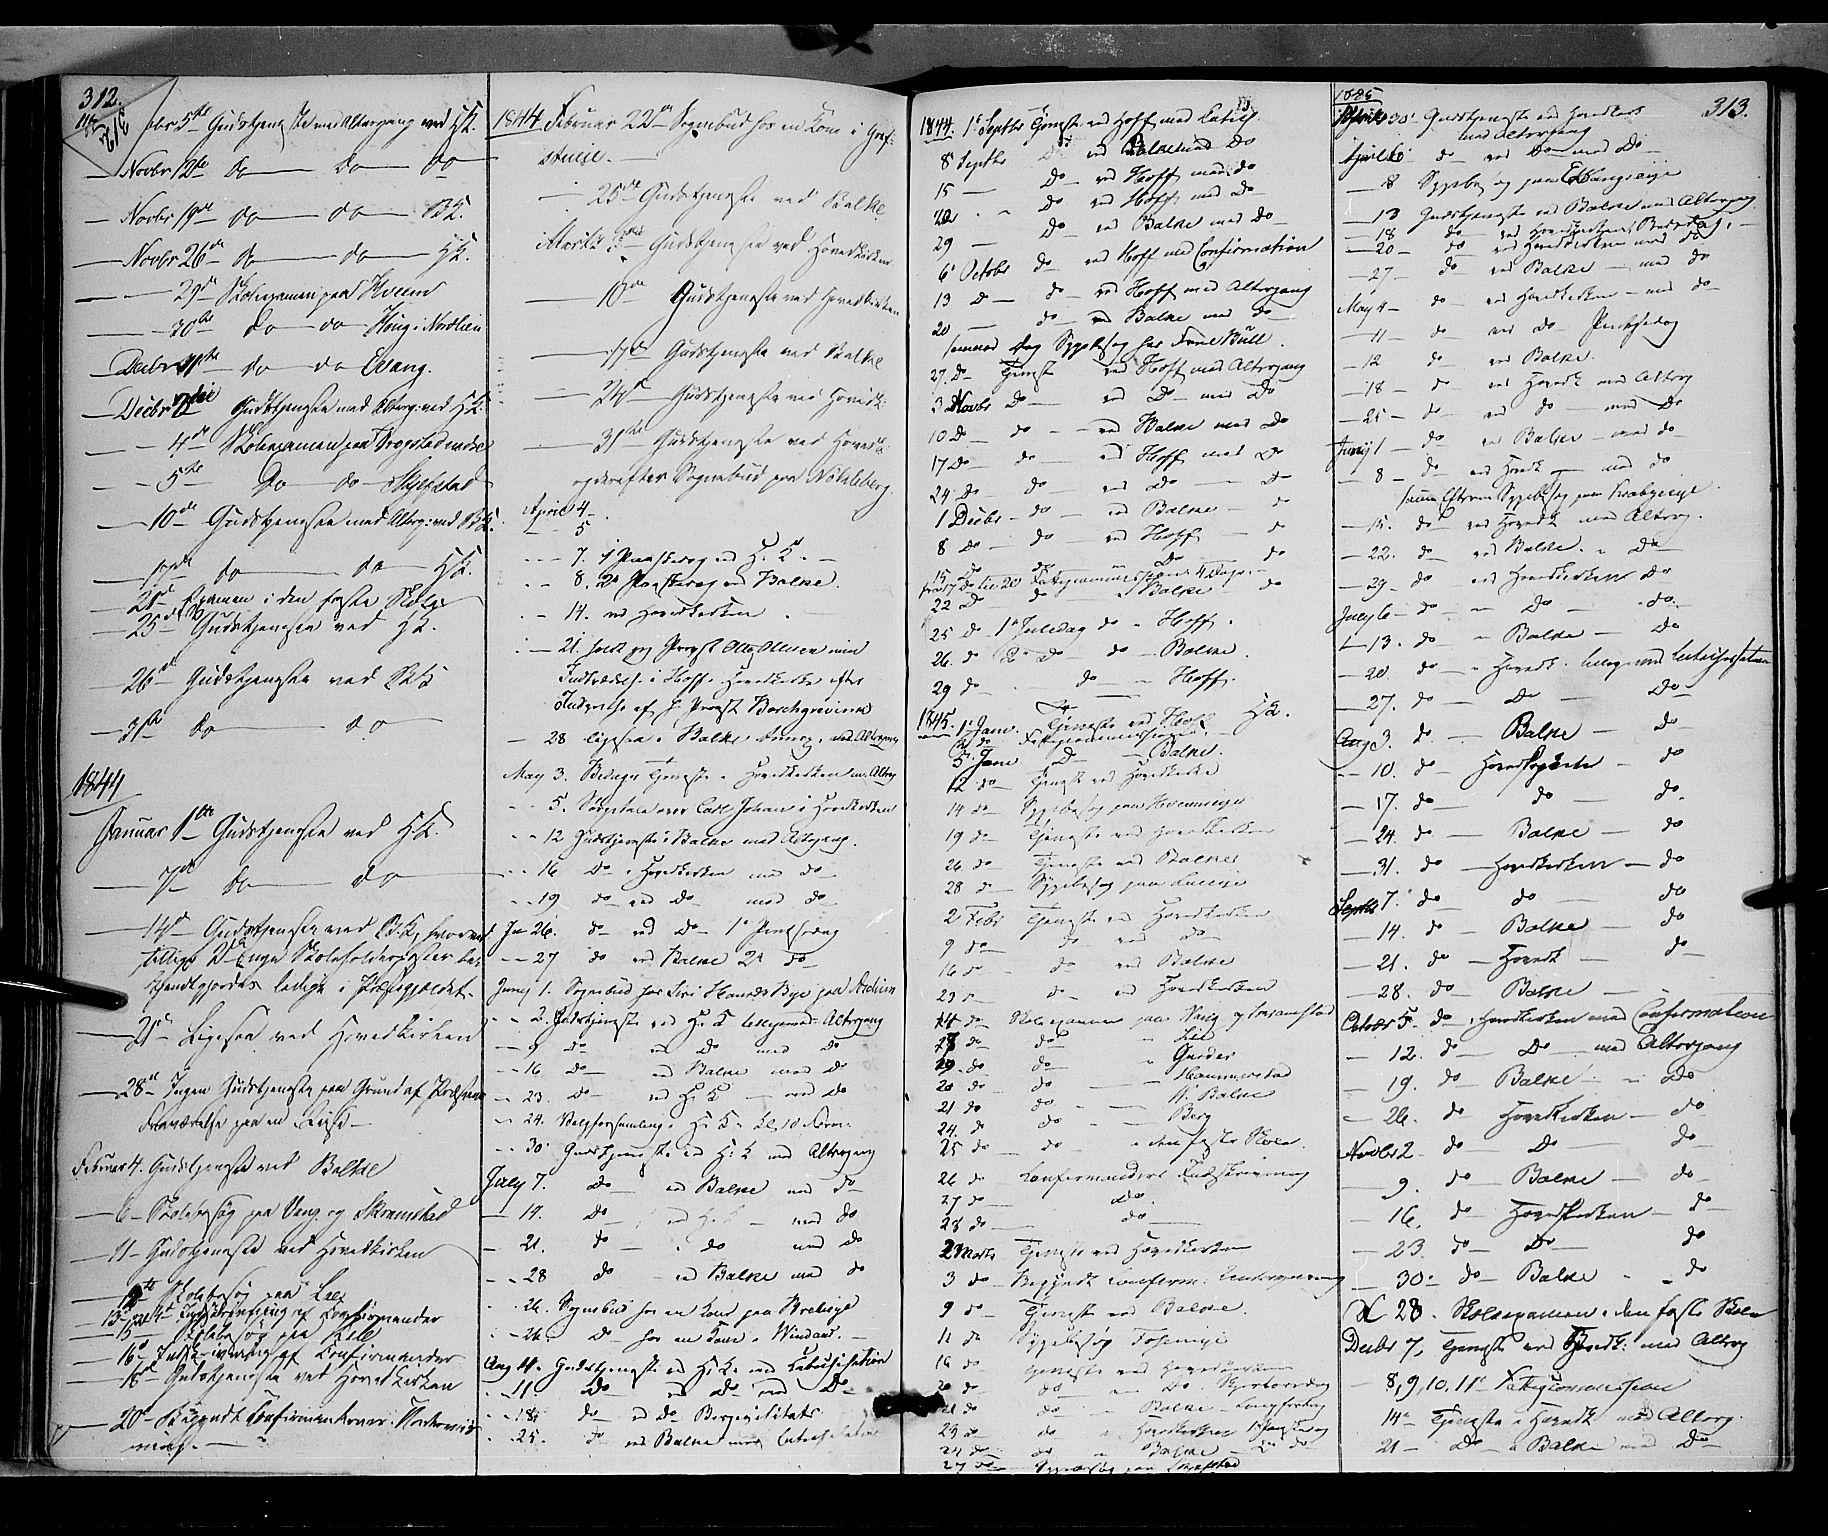 SAH, Østre Toten prestekontor, Ministerialbok nr. 2, 1840-1847, s. 313